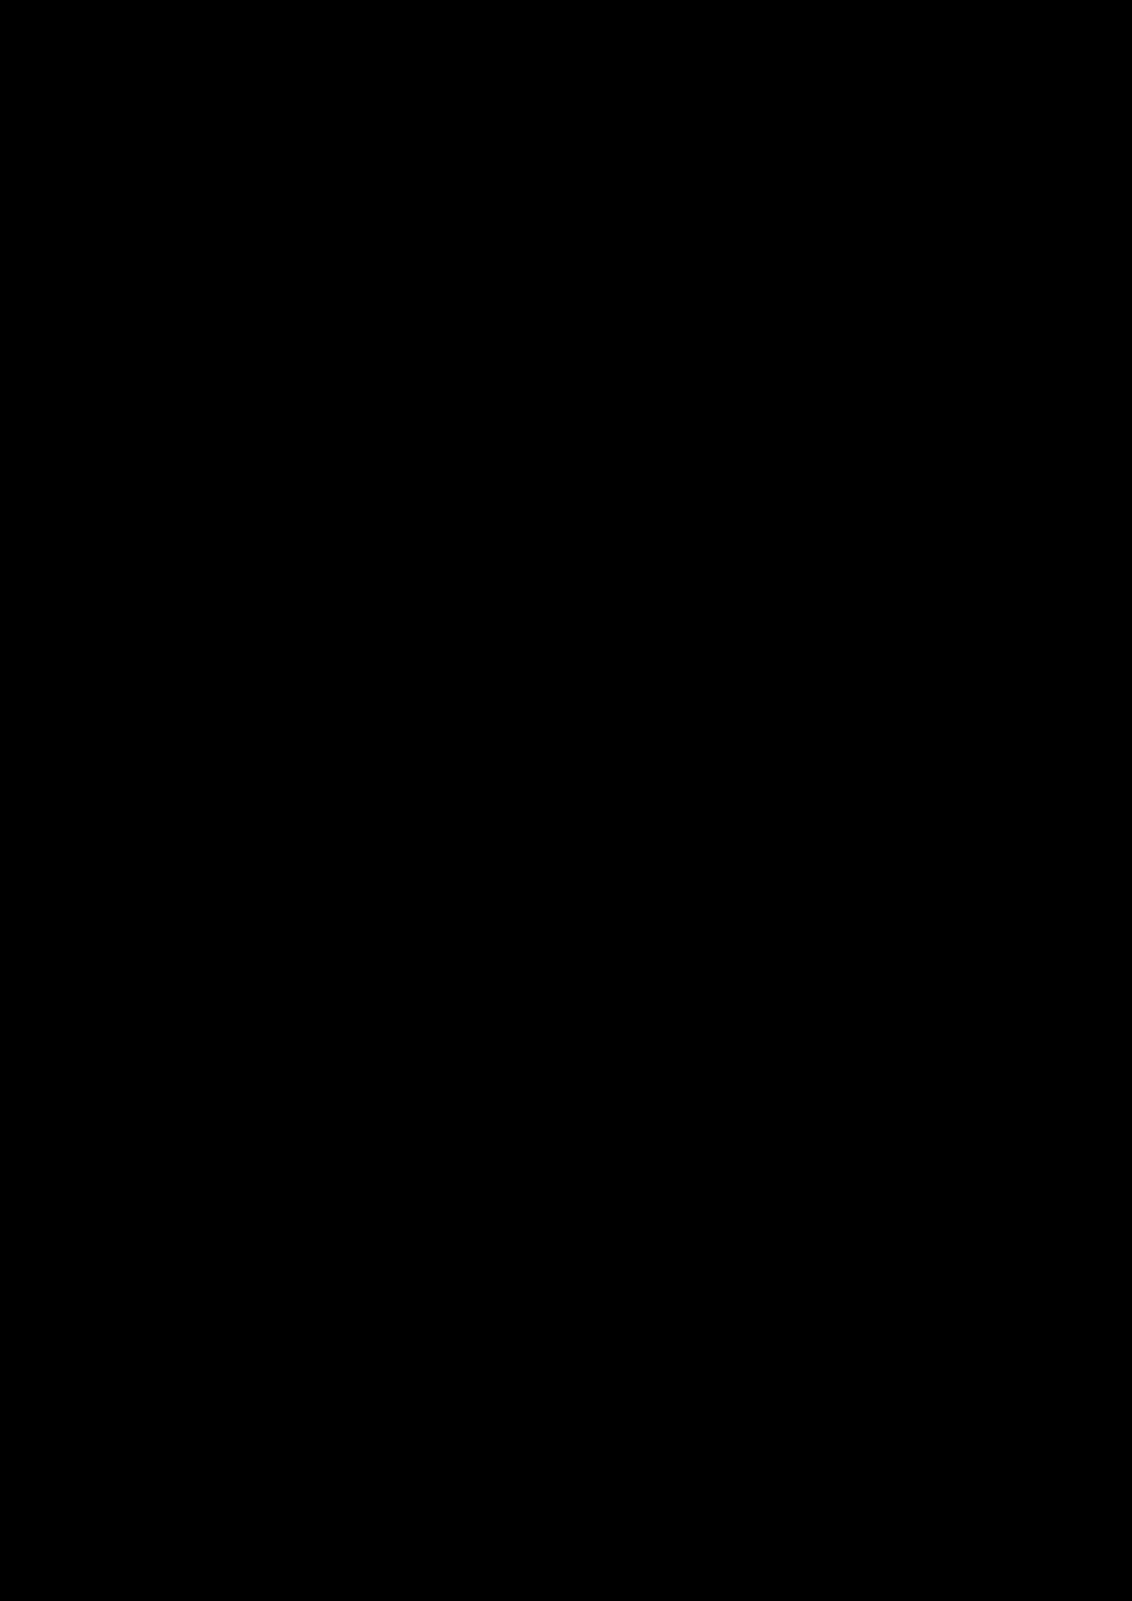 N.A.S.T.YA slide, Image 64